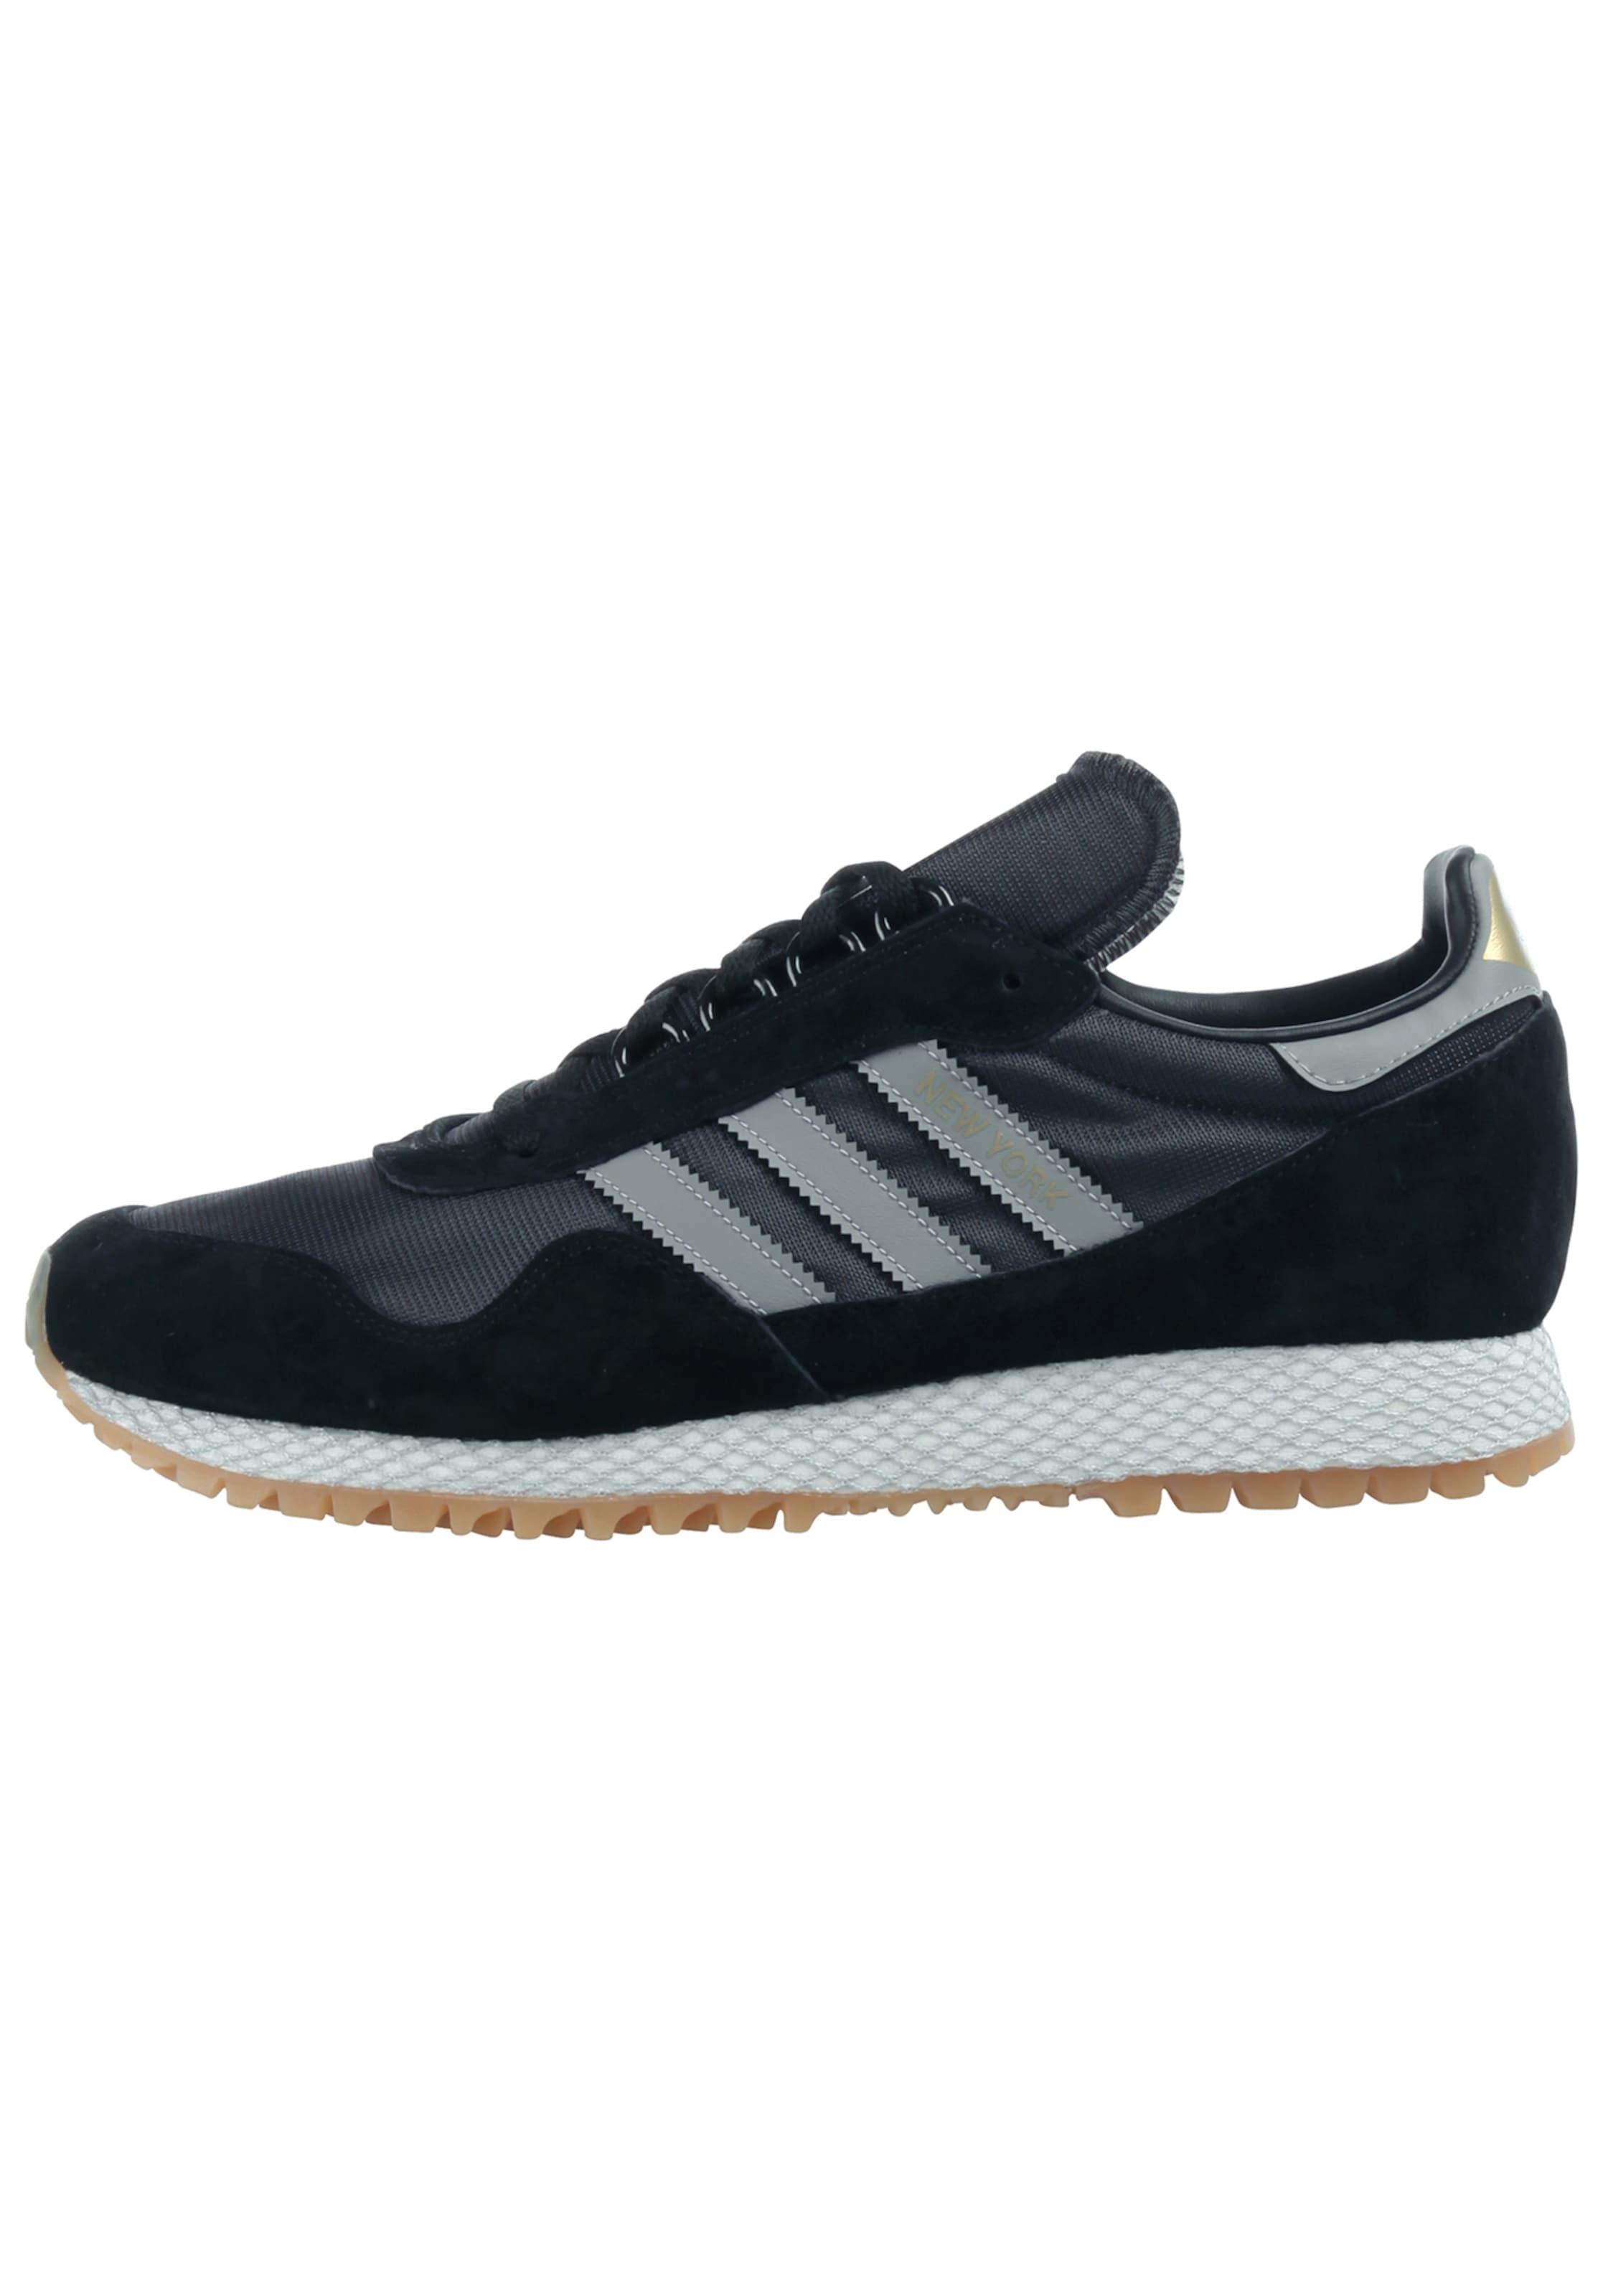 ADIDAS ORIGINALS New York Sneaker Hohe Qualität